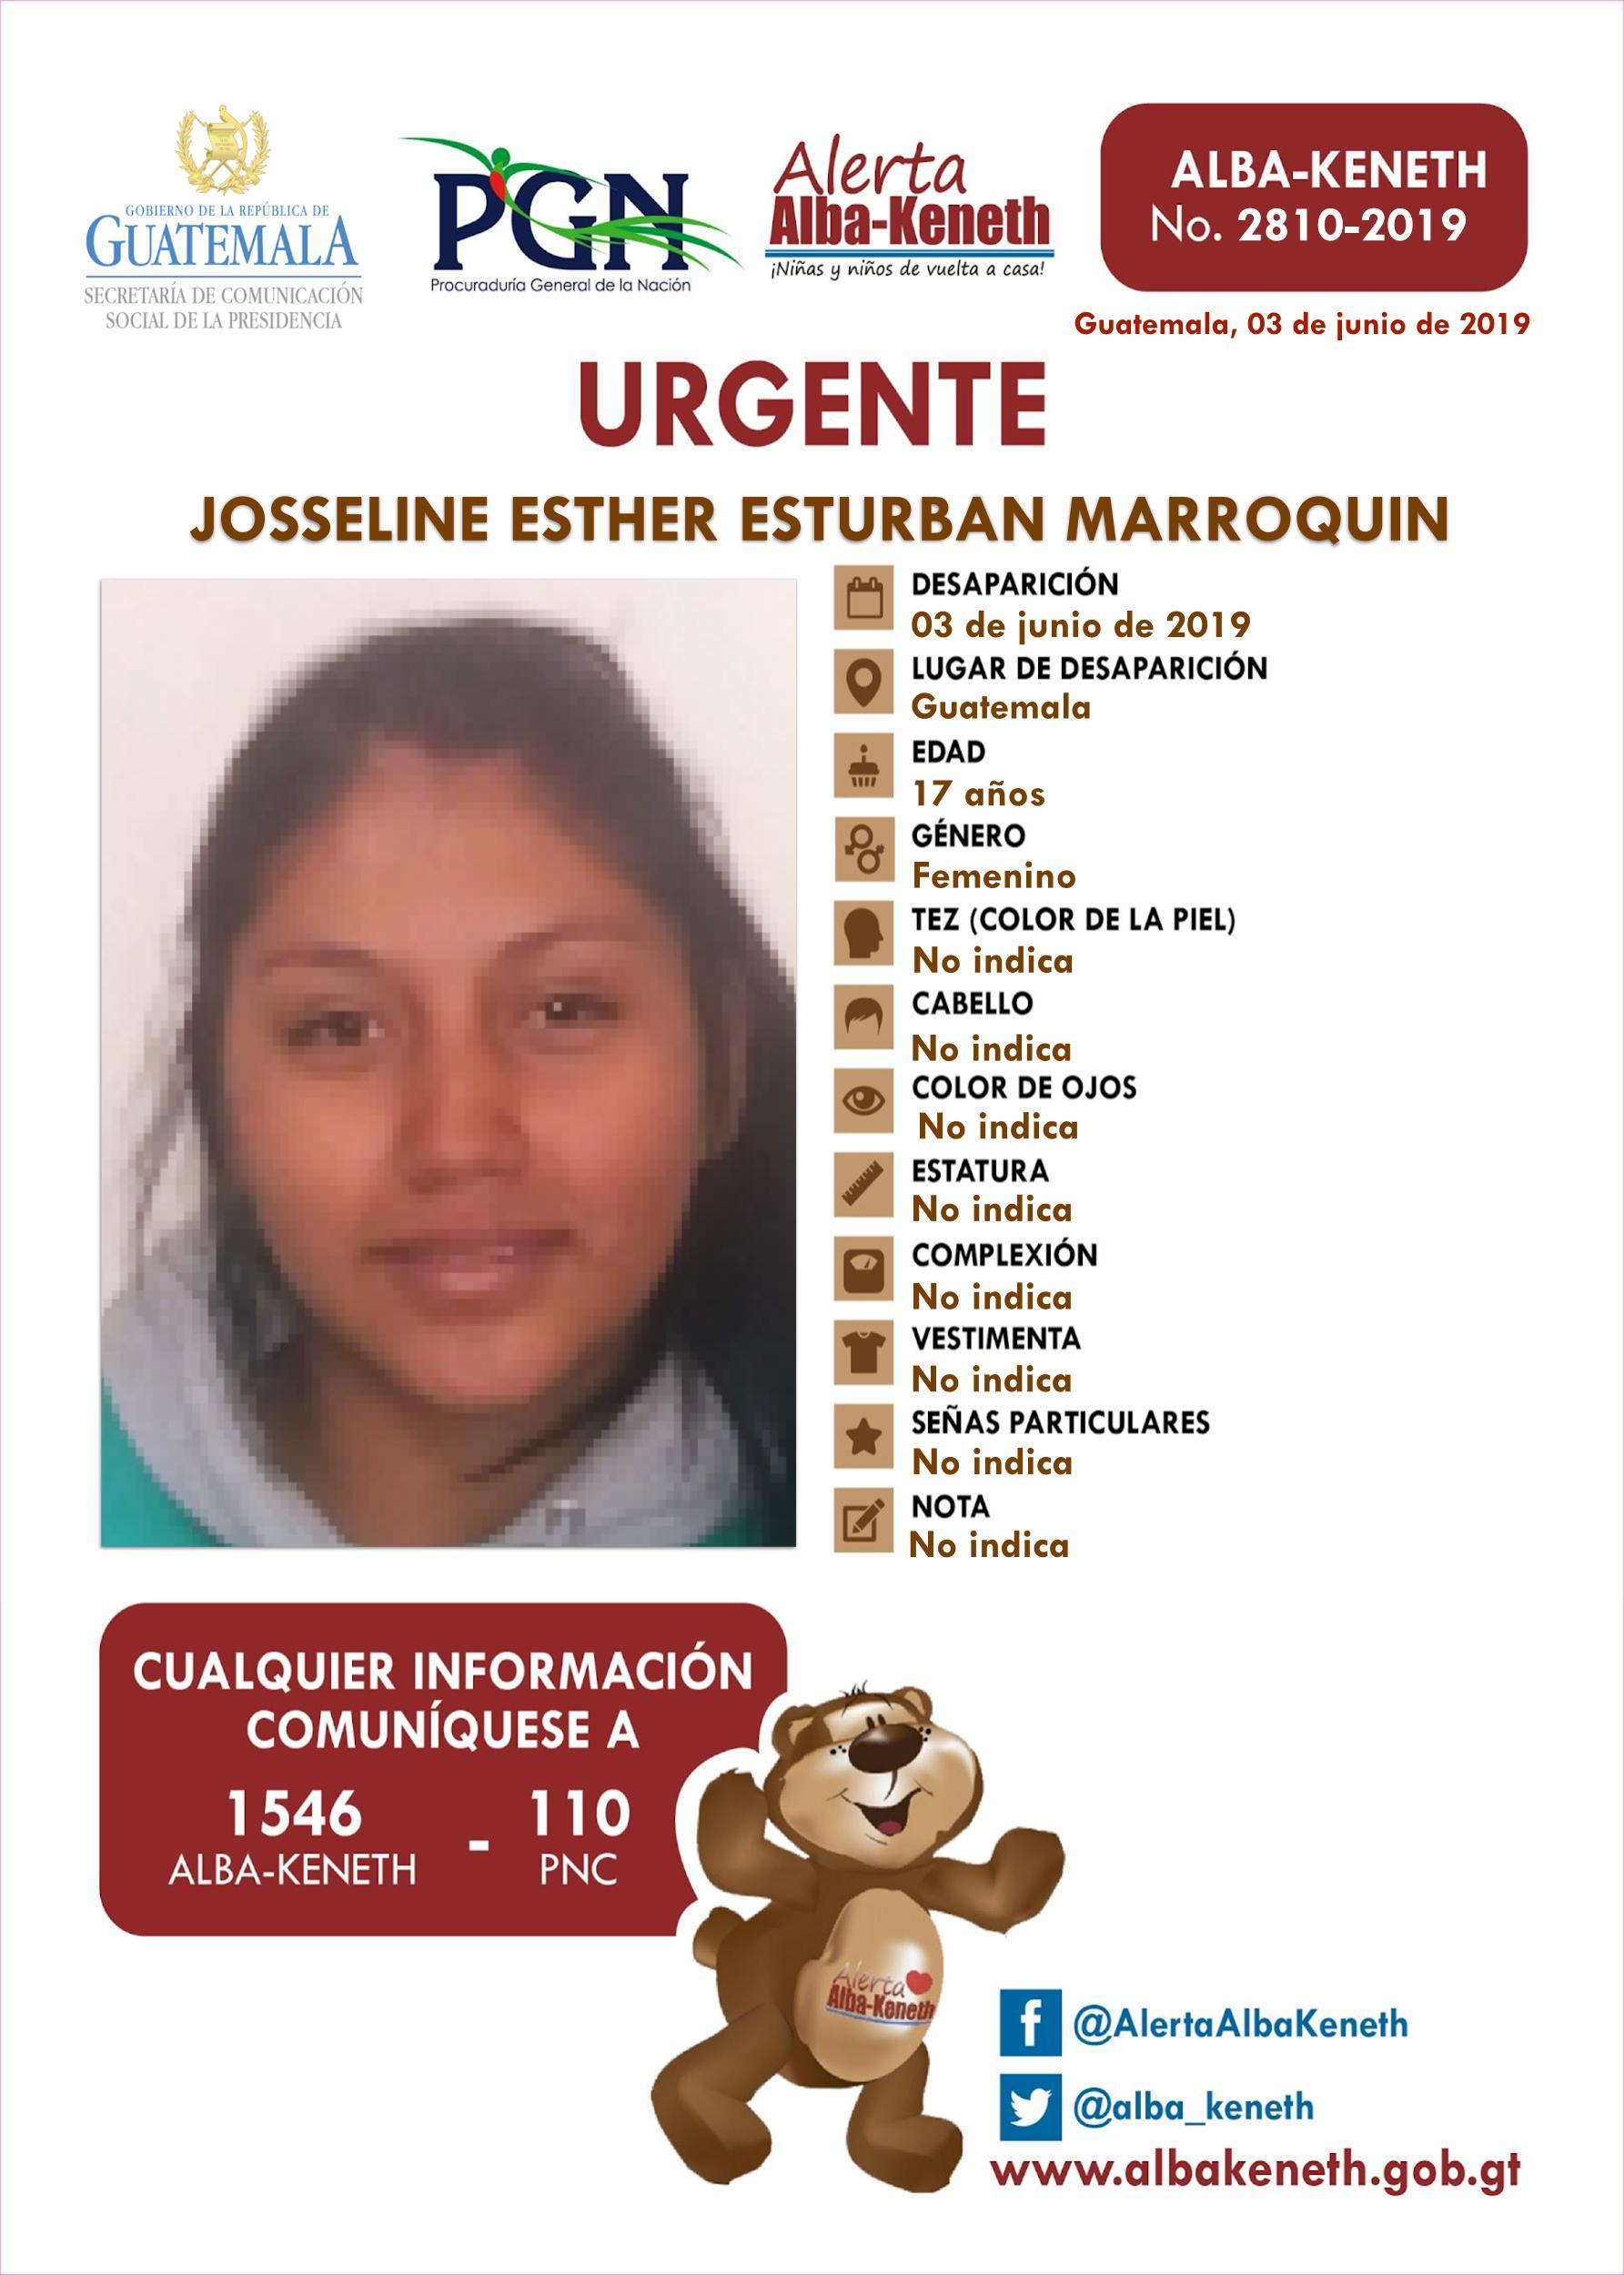 Josseline Esther Esturban Marroquin